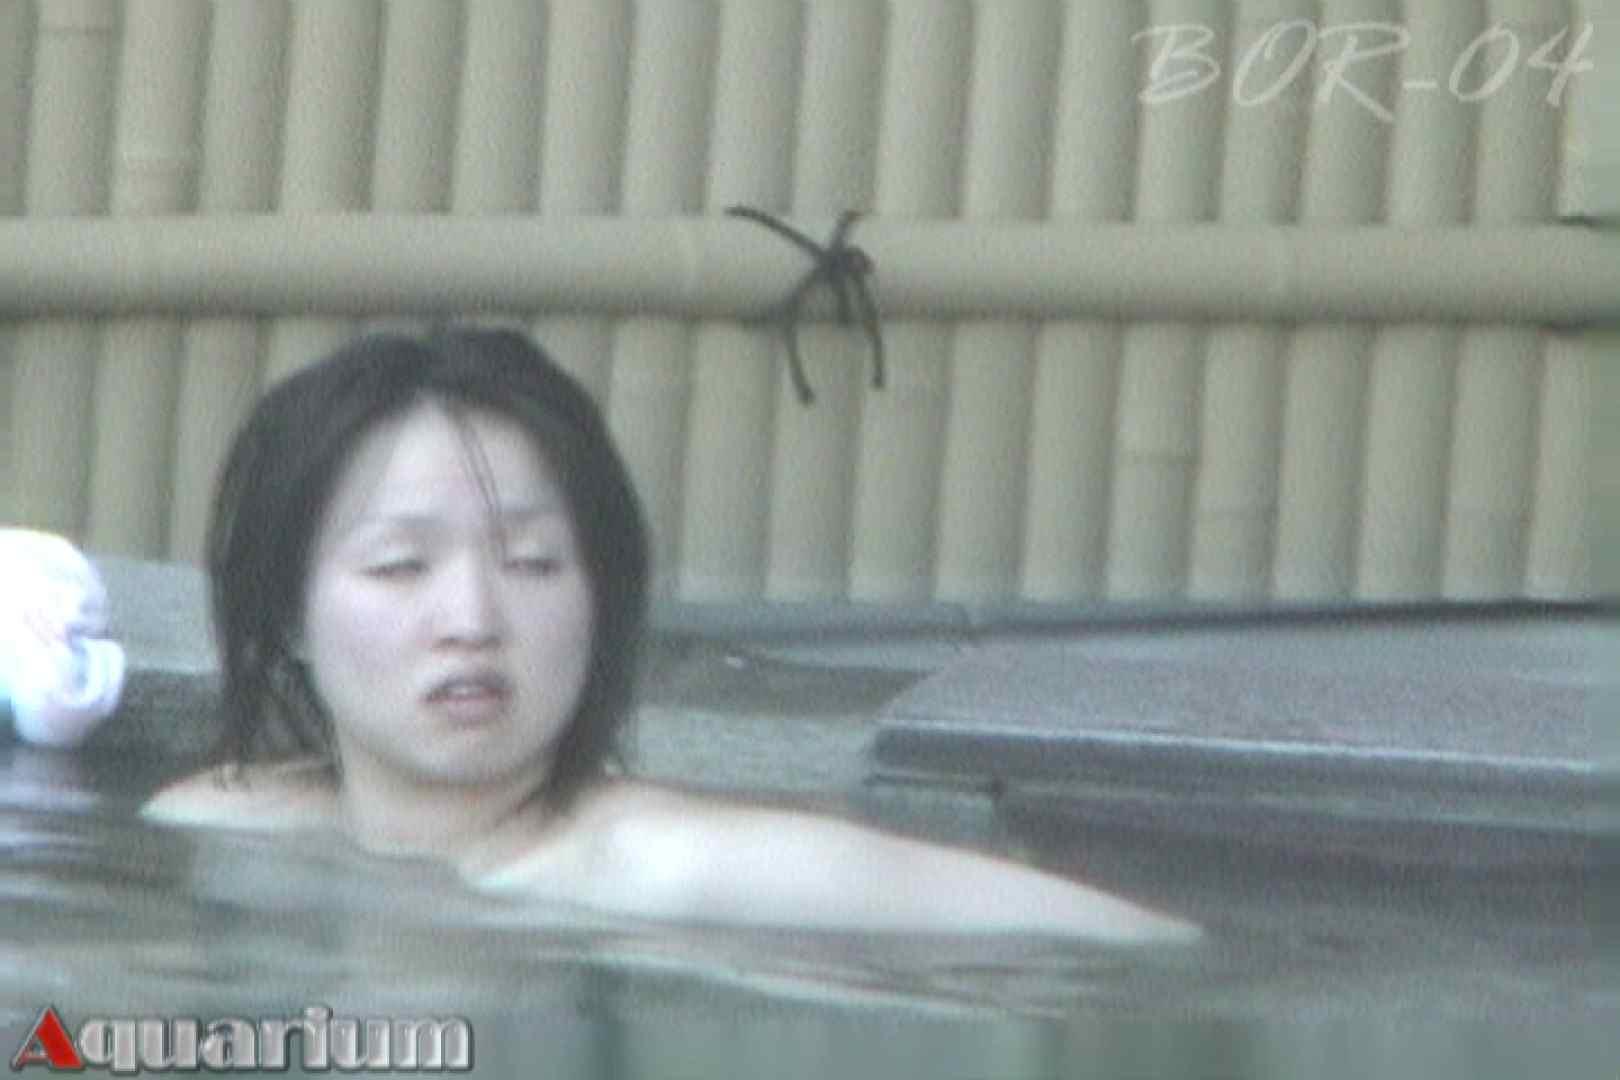 Aquaな露天風呂Vol.513 OL女体 | 露天  77連発 4